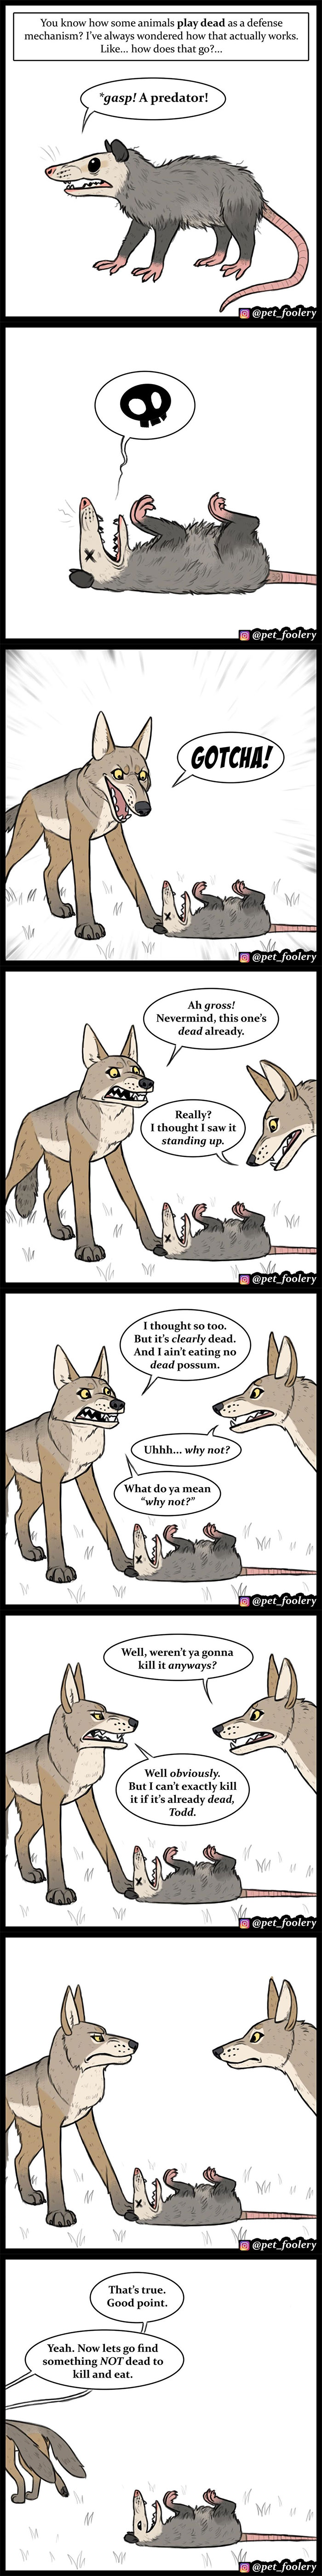 Animal-Comics-Pet-Foolery